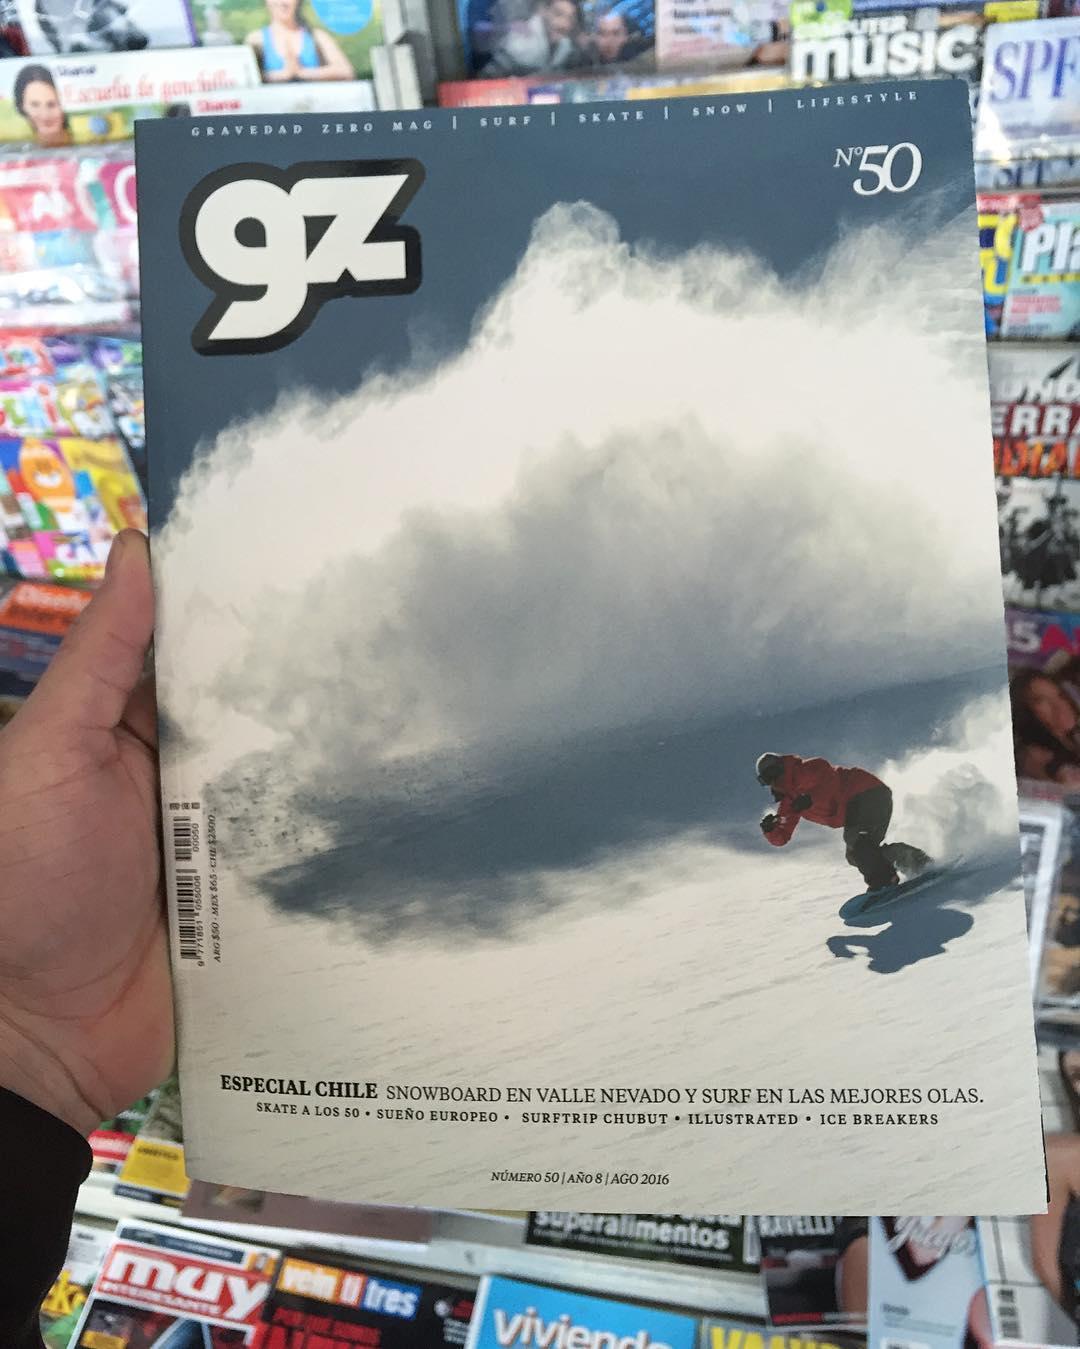 Lindo ir a un kiosco y encontrar a  @natalurdi en la tapa de la revista @gravedadzerotv  #snowboarding  ph @julianlausi